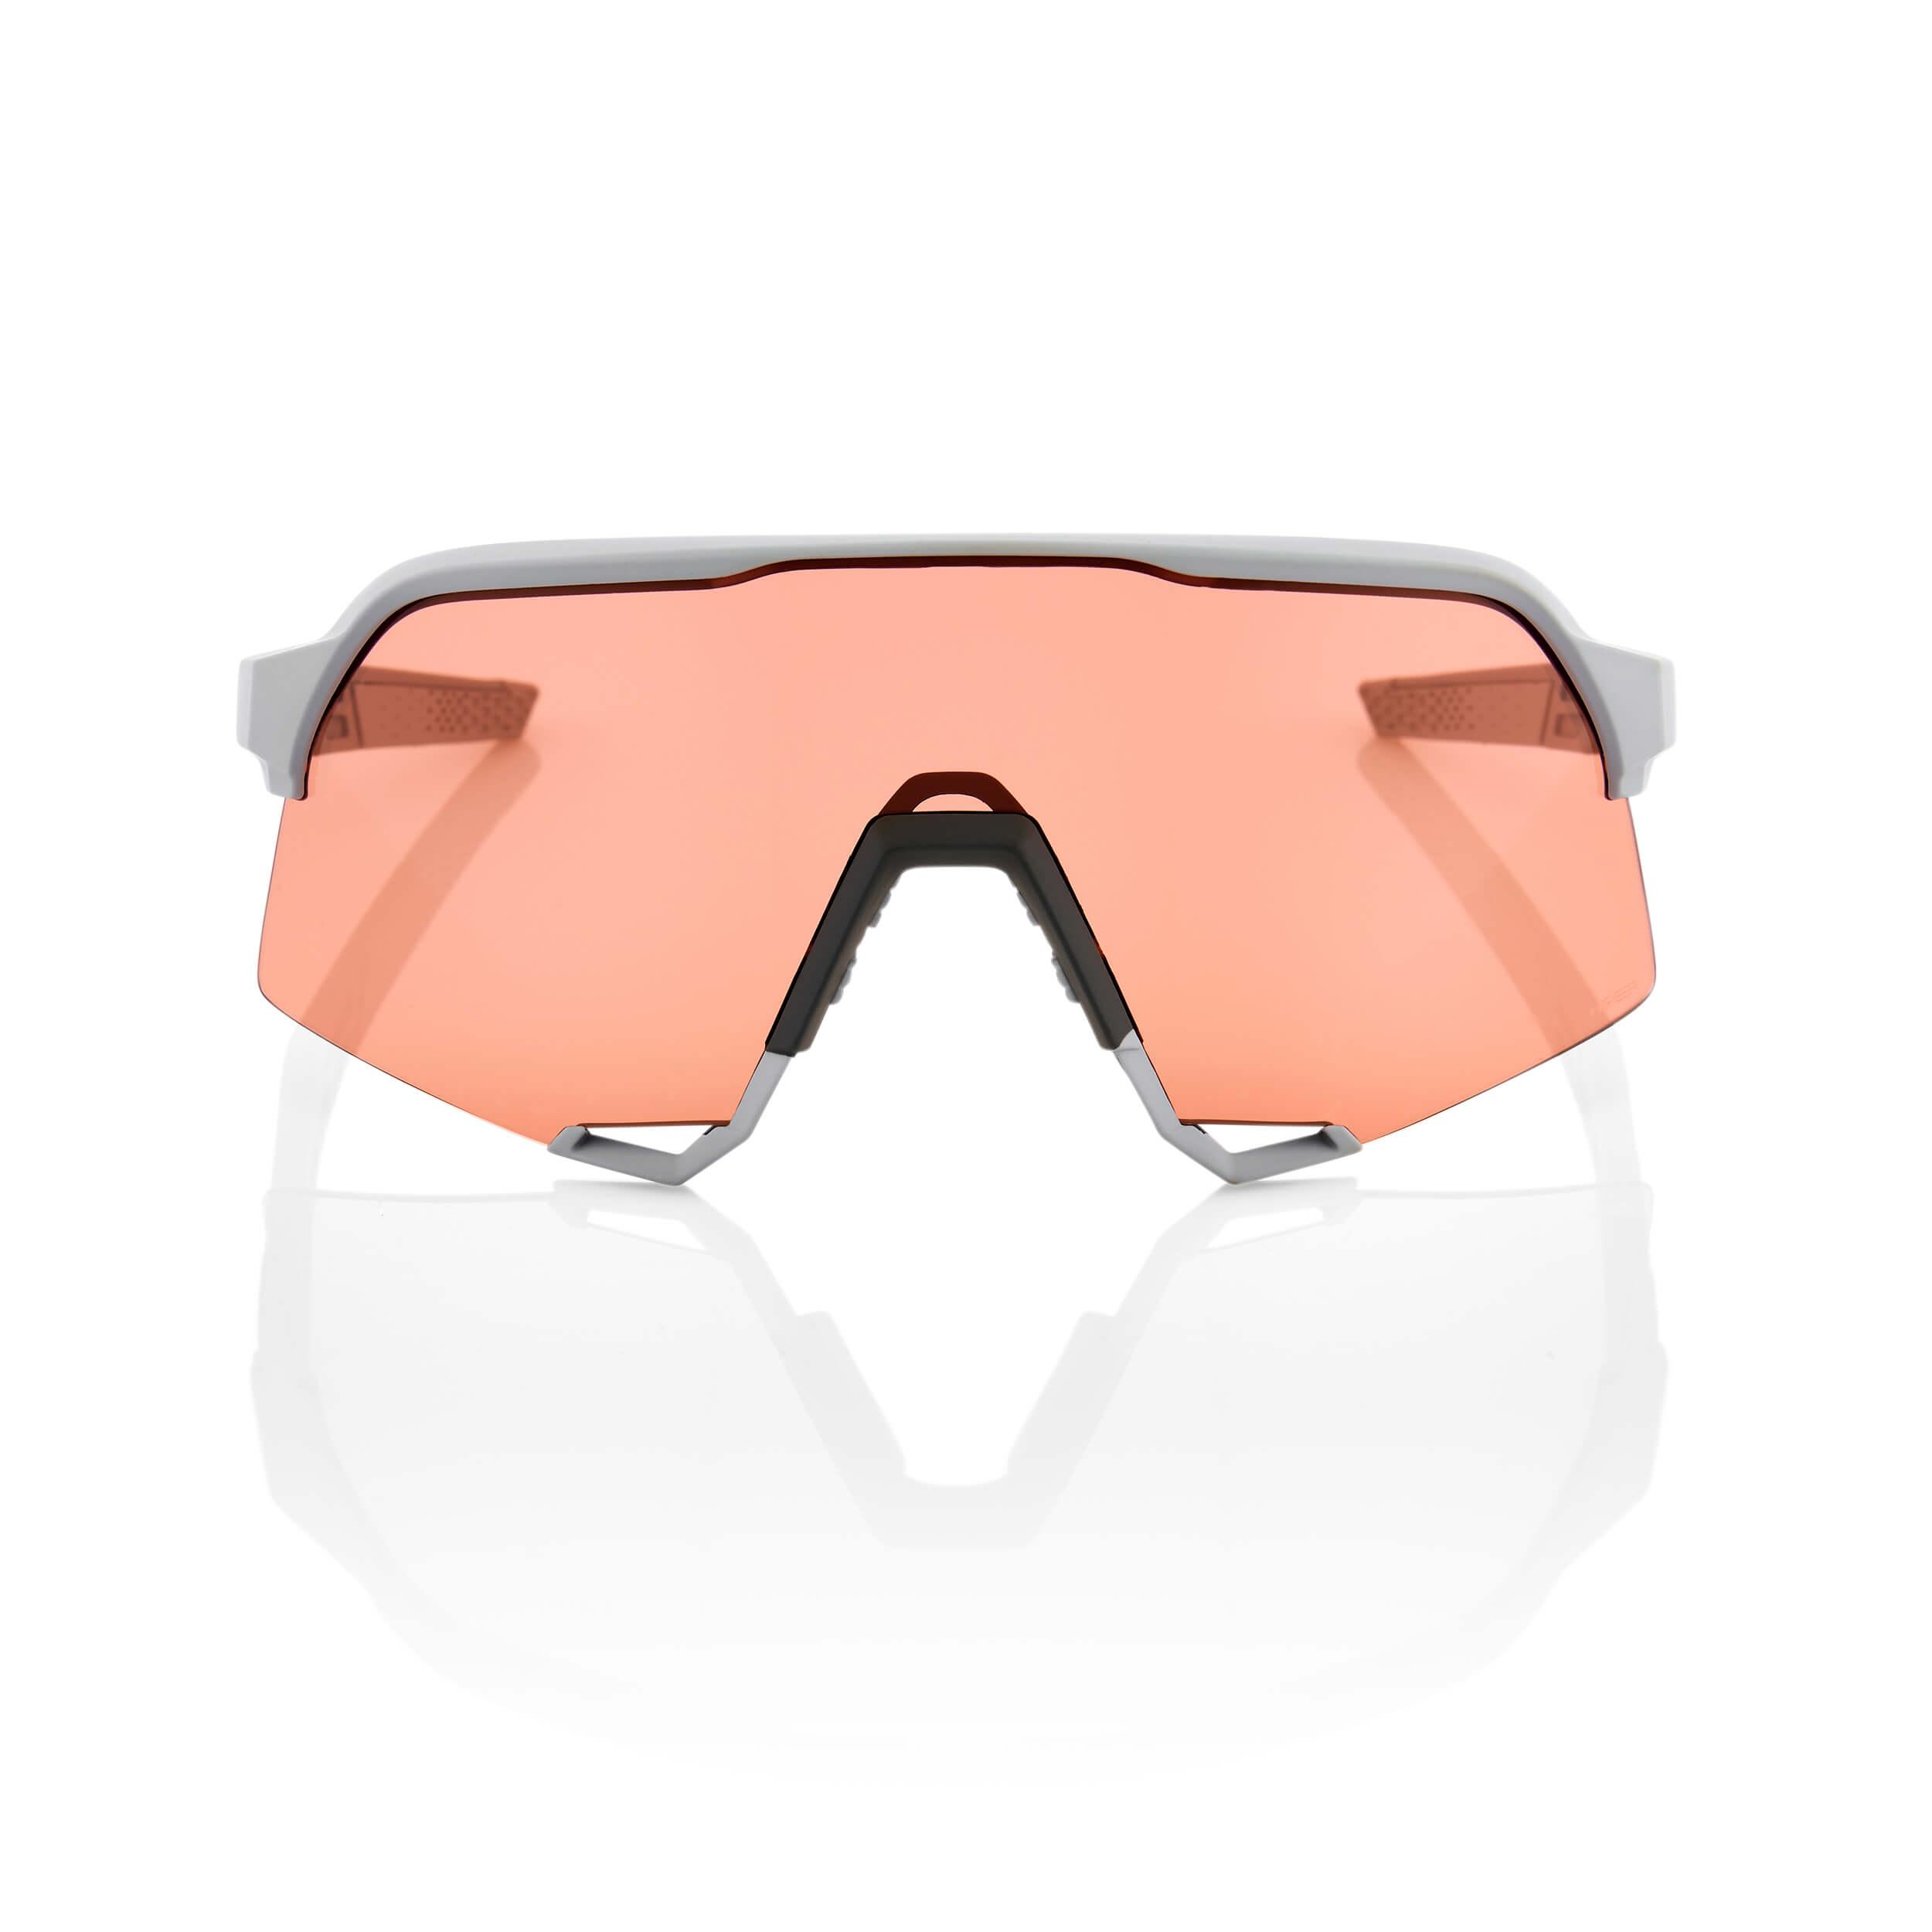 S3 – Soft Tact Stone Grey – HiPER Coral Lens